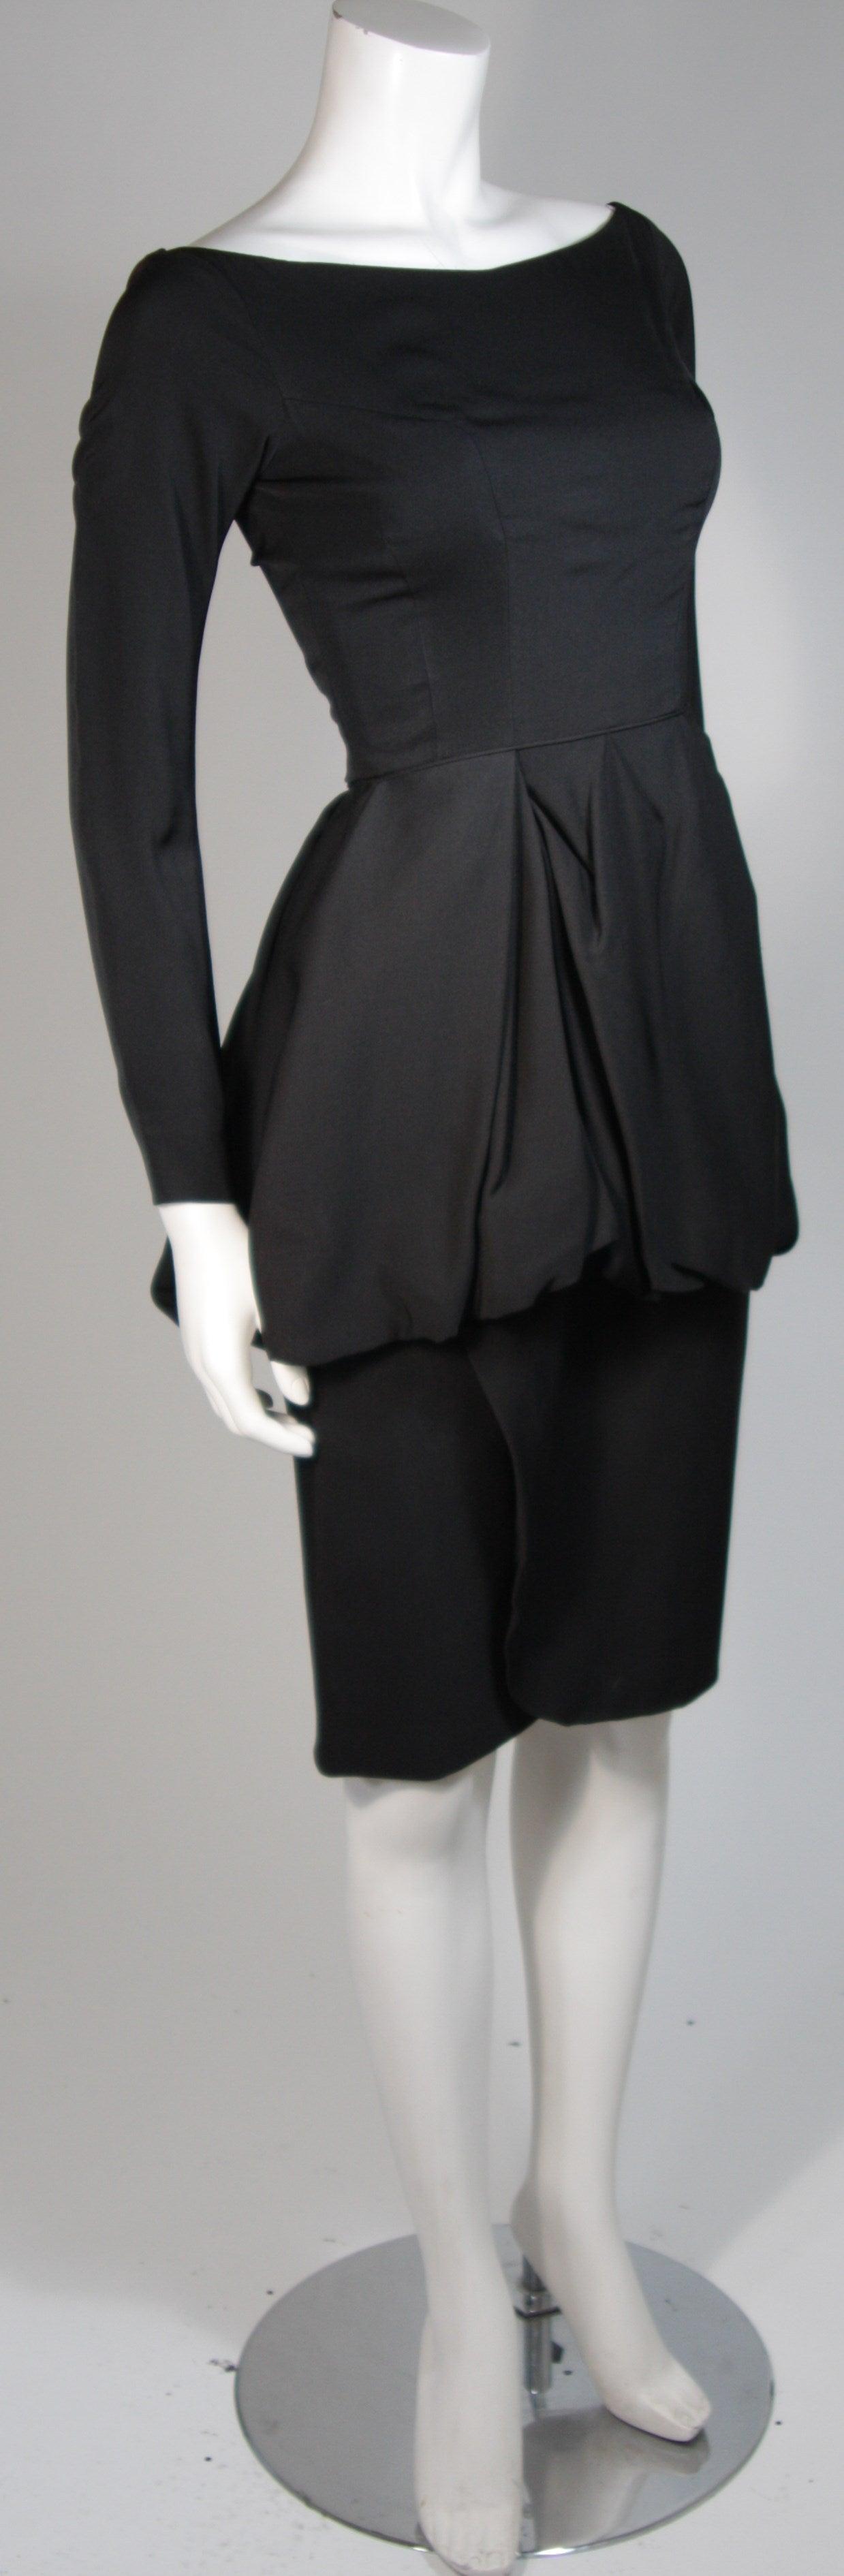 Ceil Chapman Black Draped Princess Seam Peplum Style Waist Dress Size XS 4